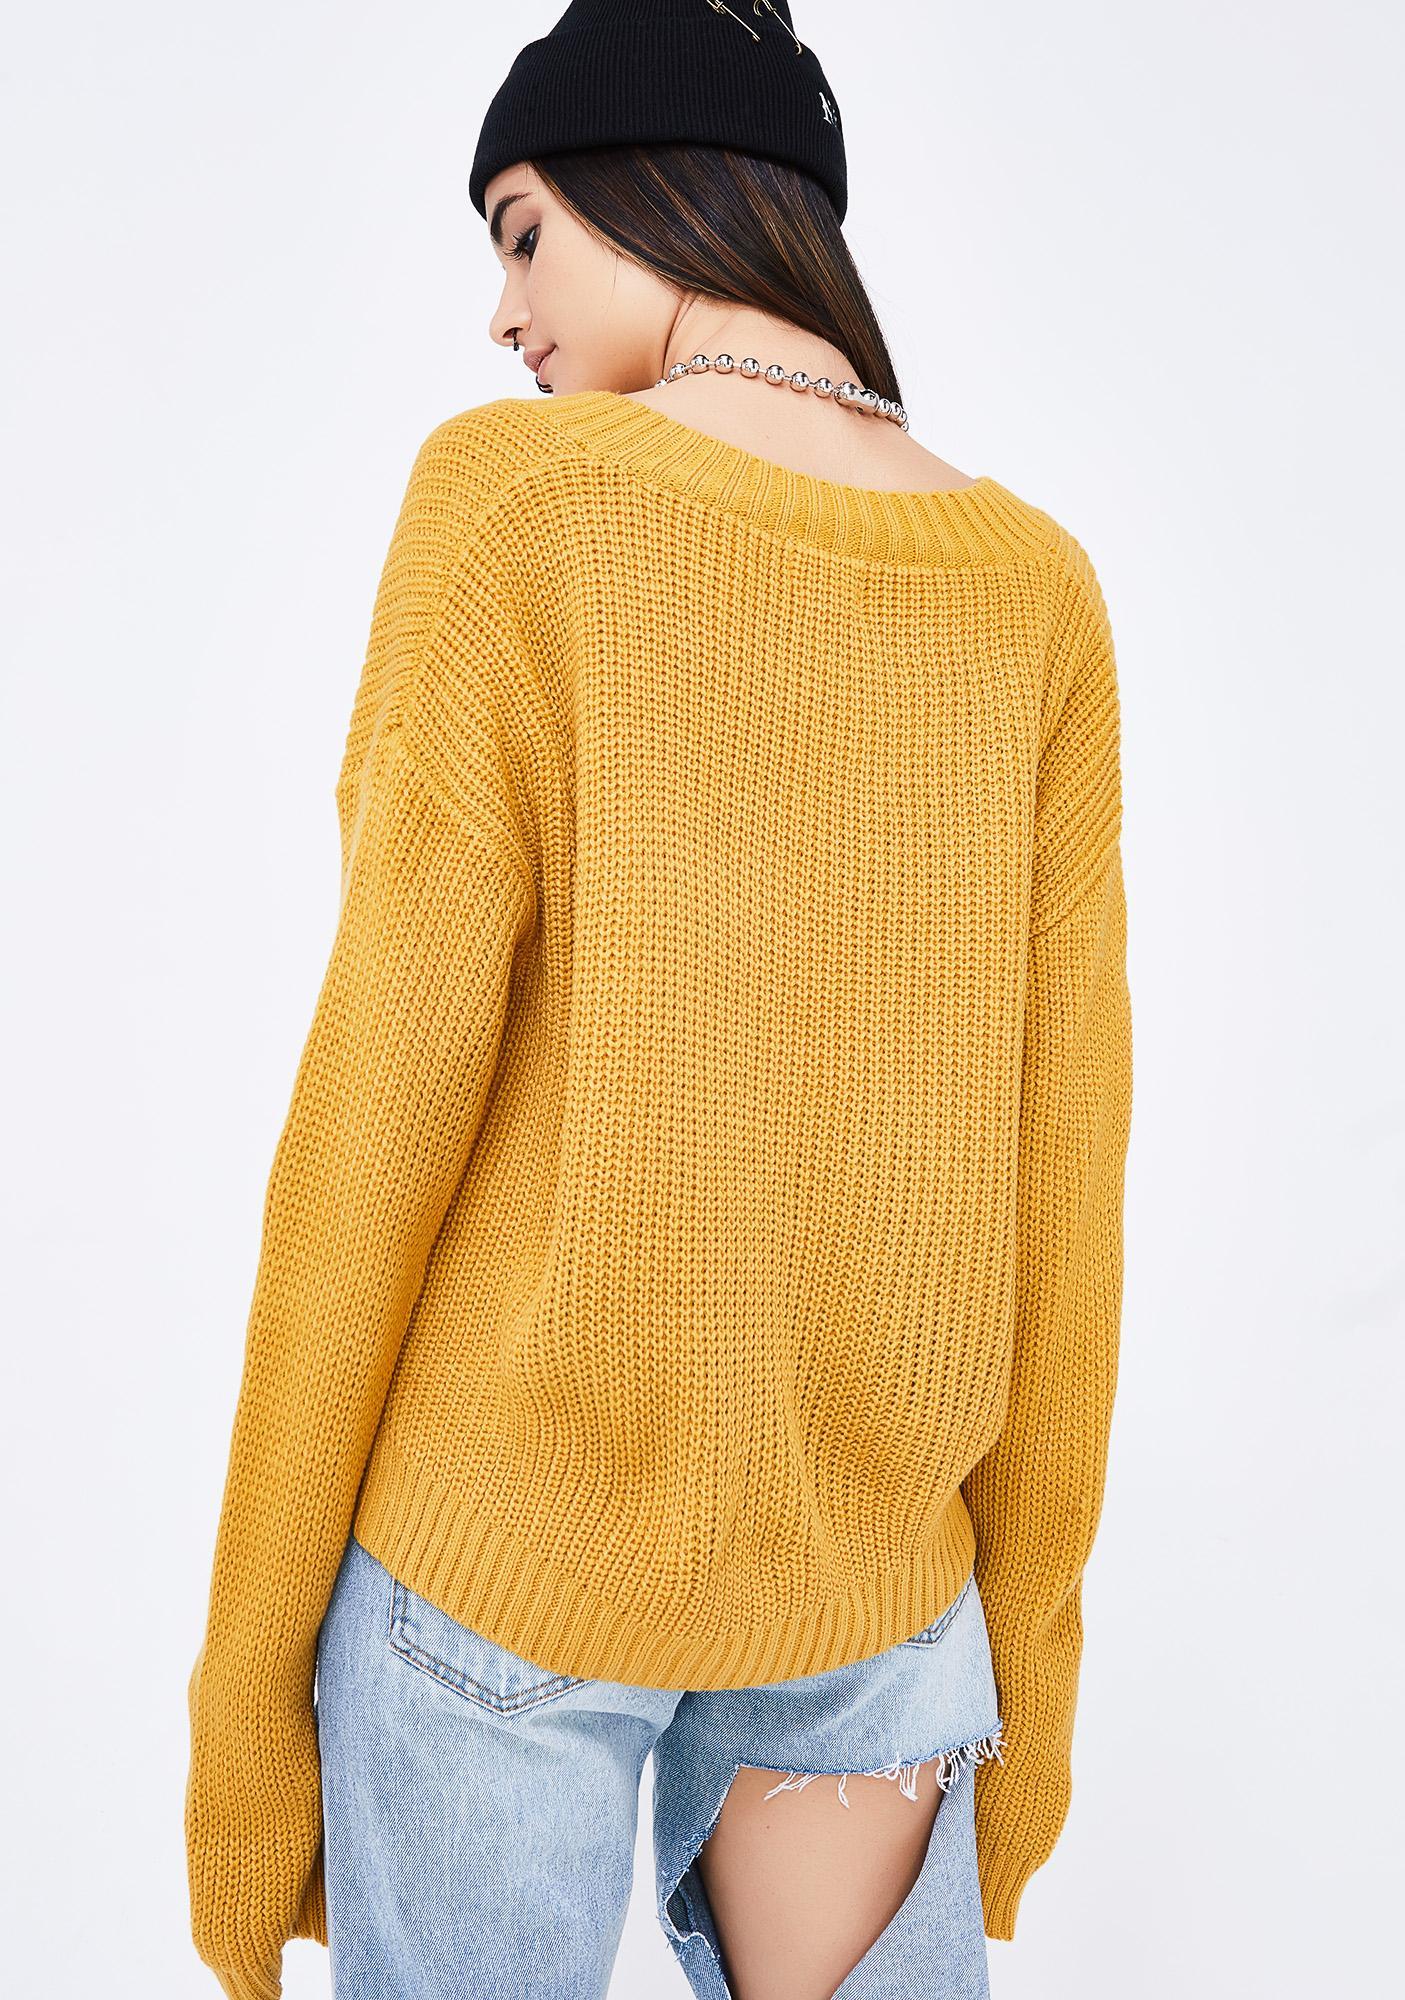 Yellow V Neck Knit Sweater | Dolls Kill